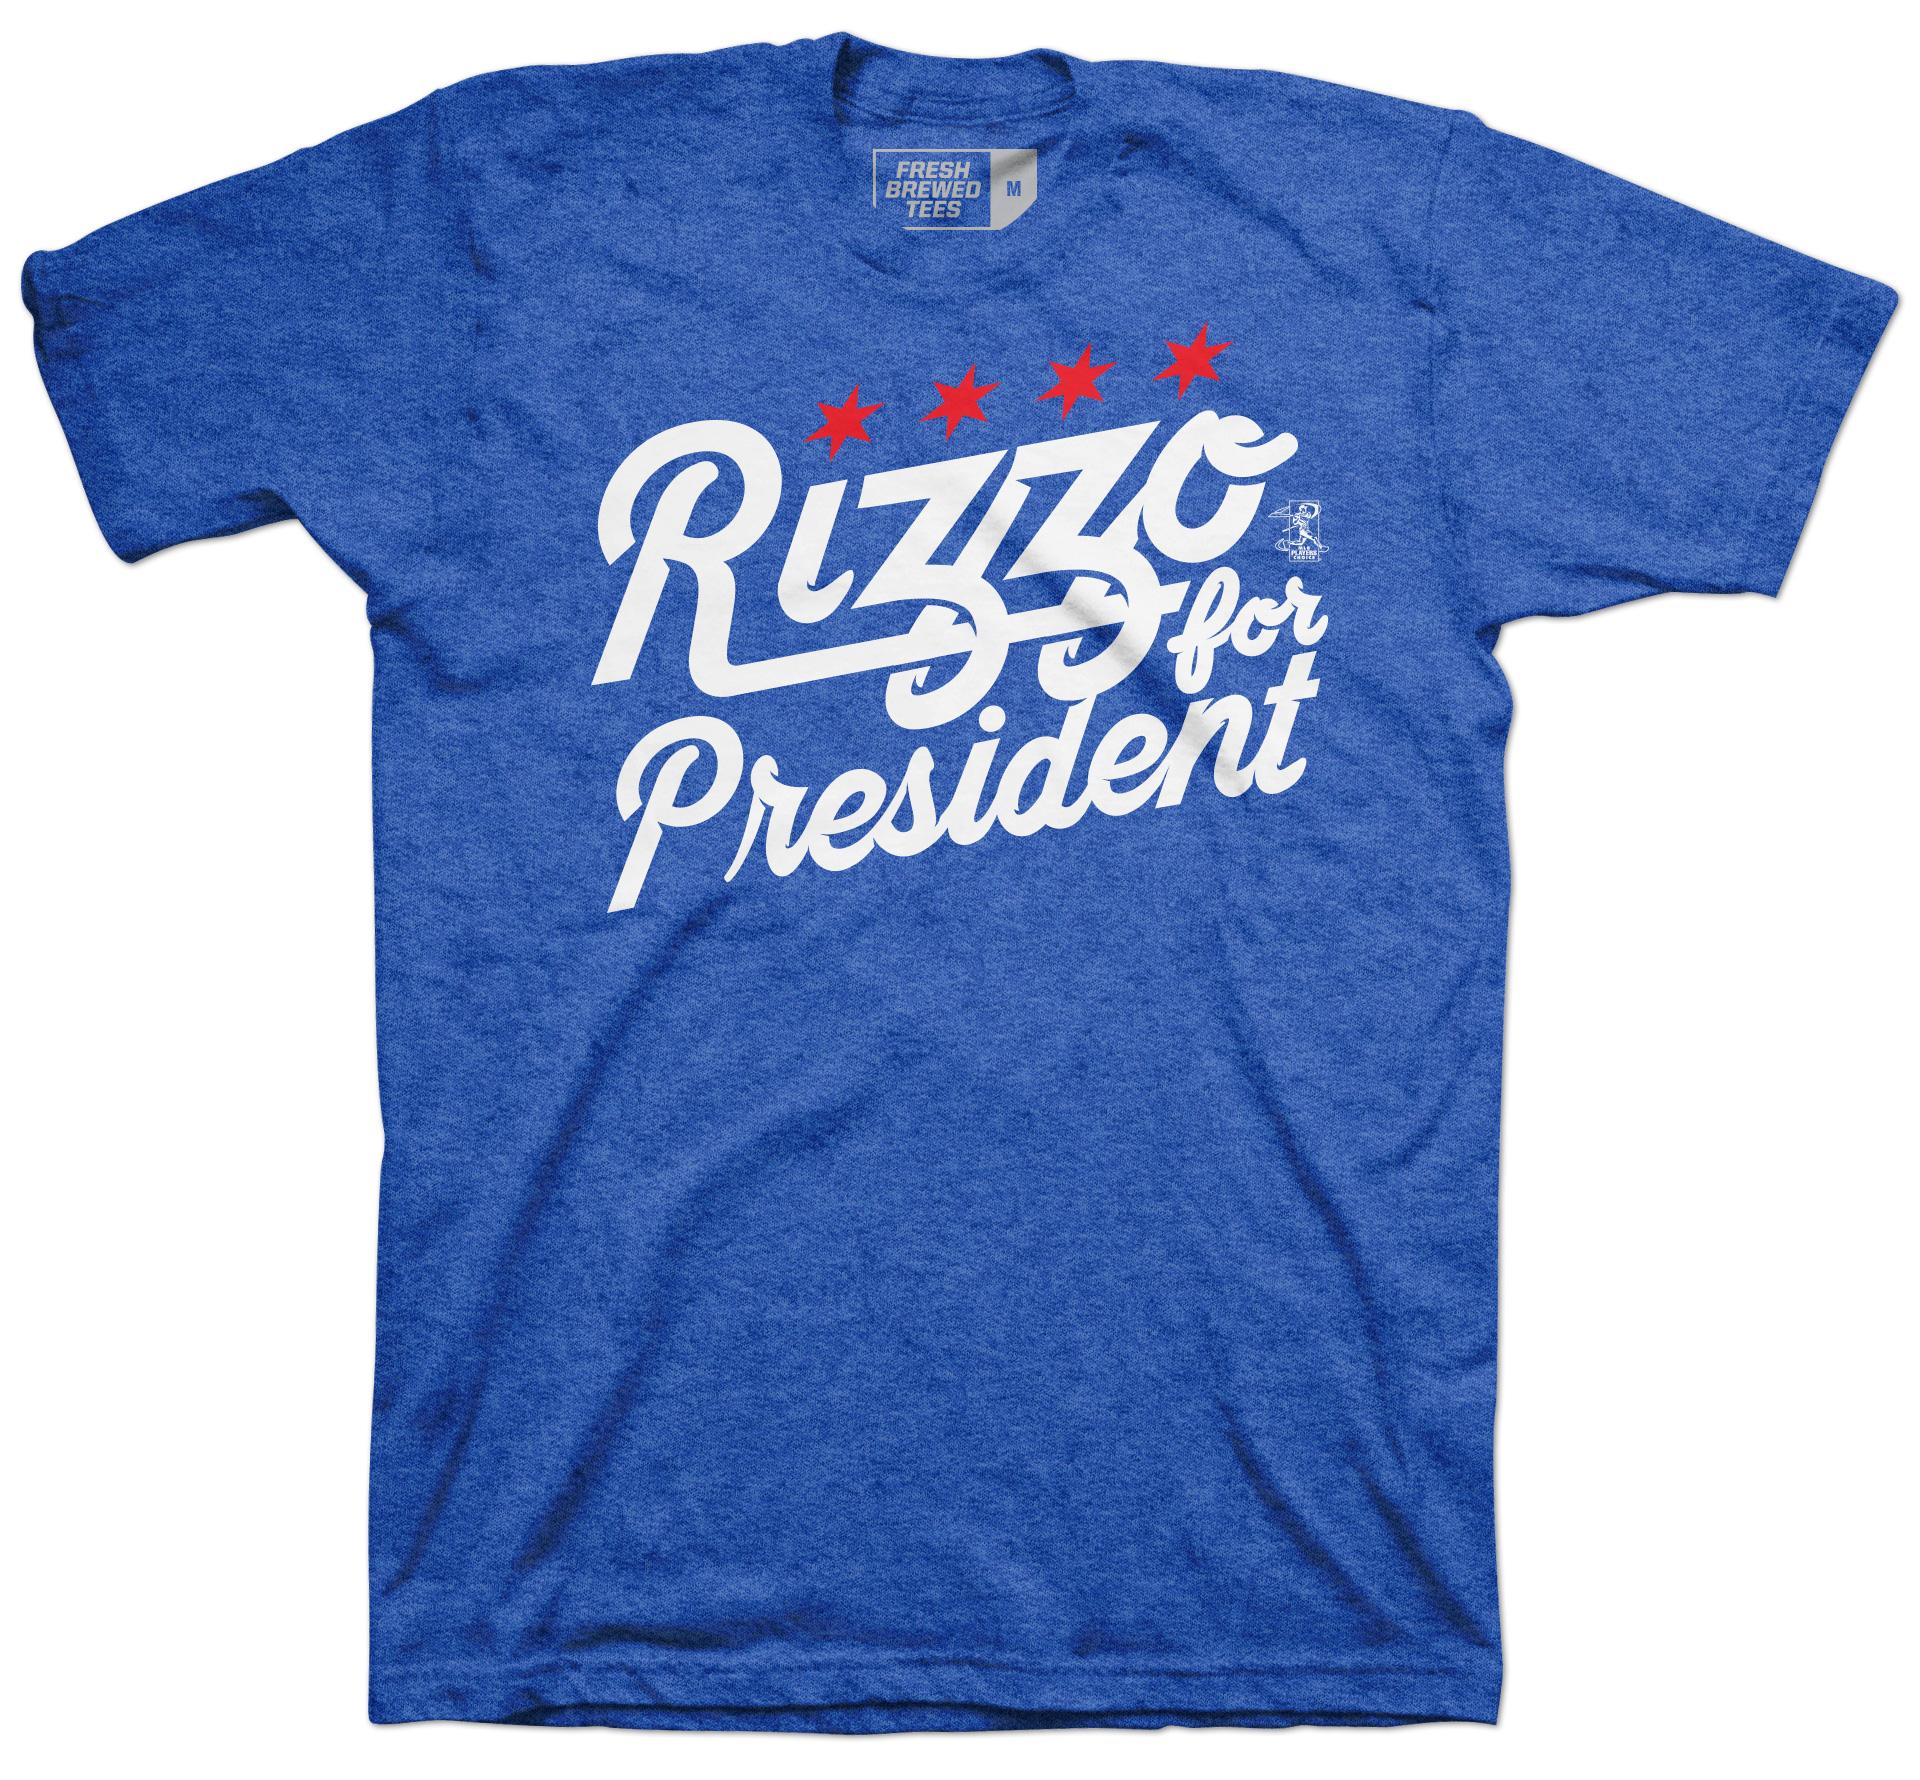 MLB0316_Rizzo-for-President 2.jpg